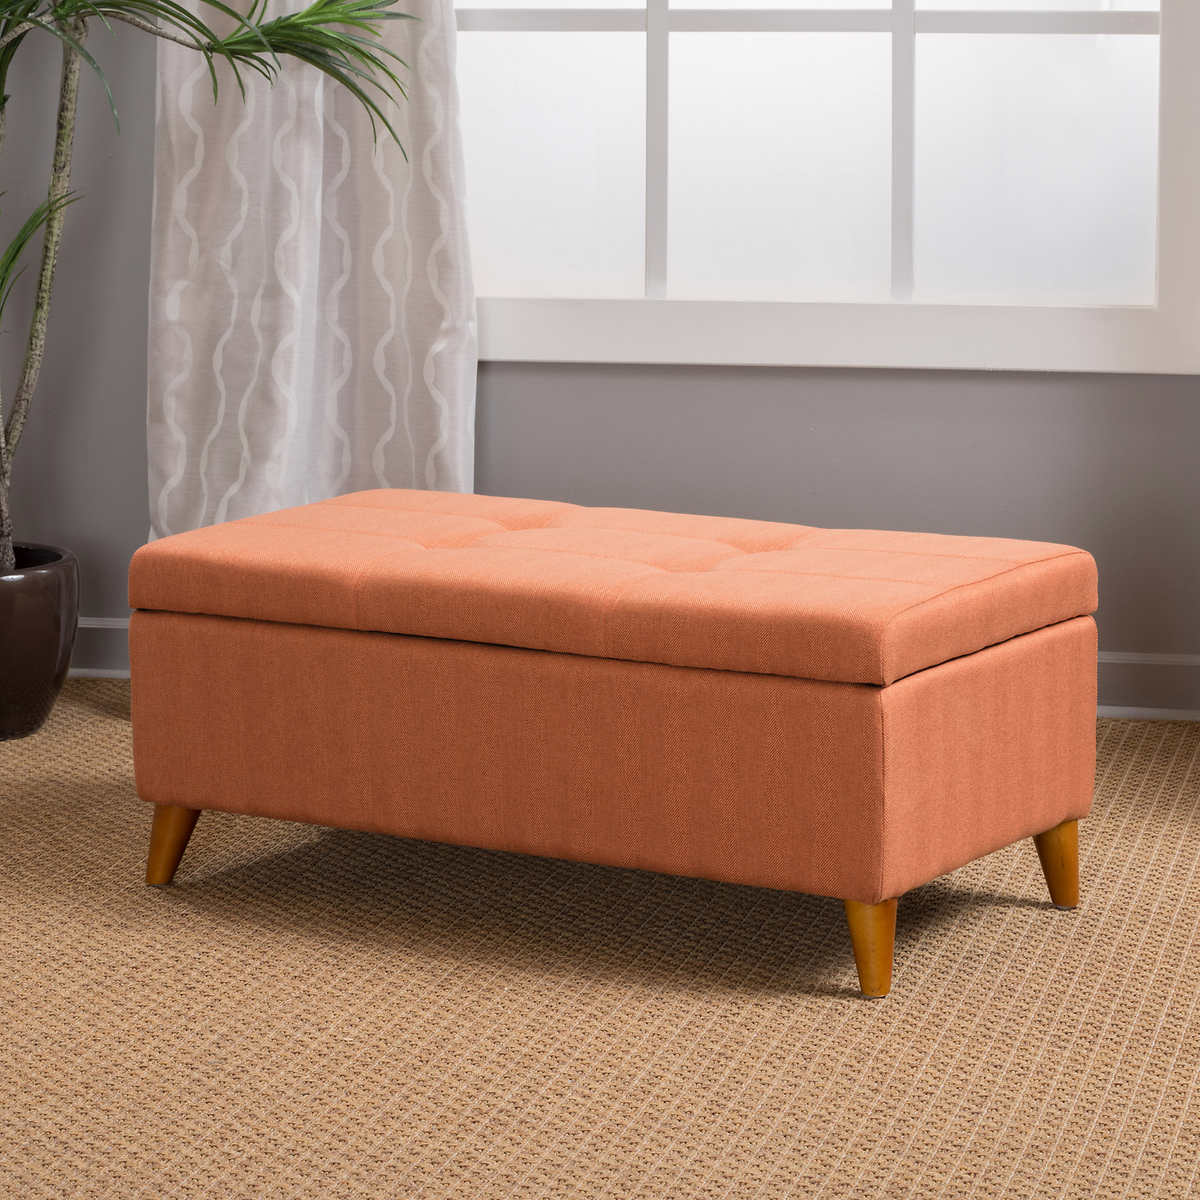 Maddox Storage Bench, Orange - Ottomans & Benches Costco